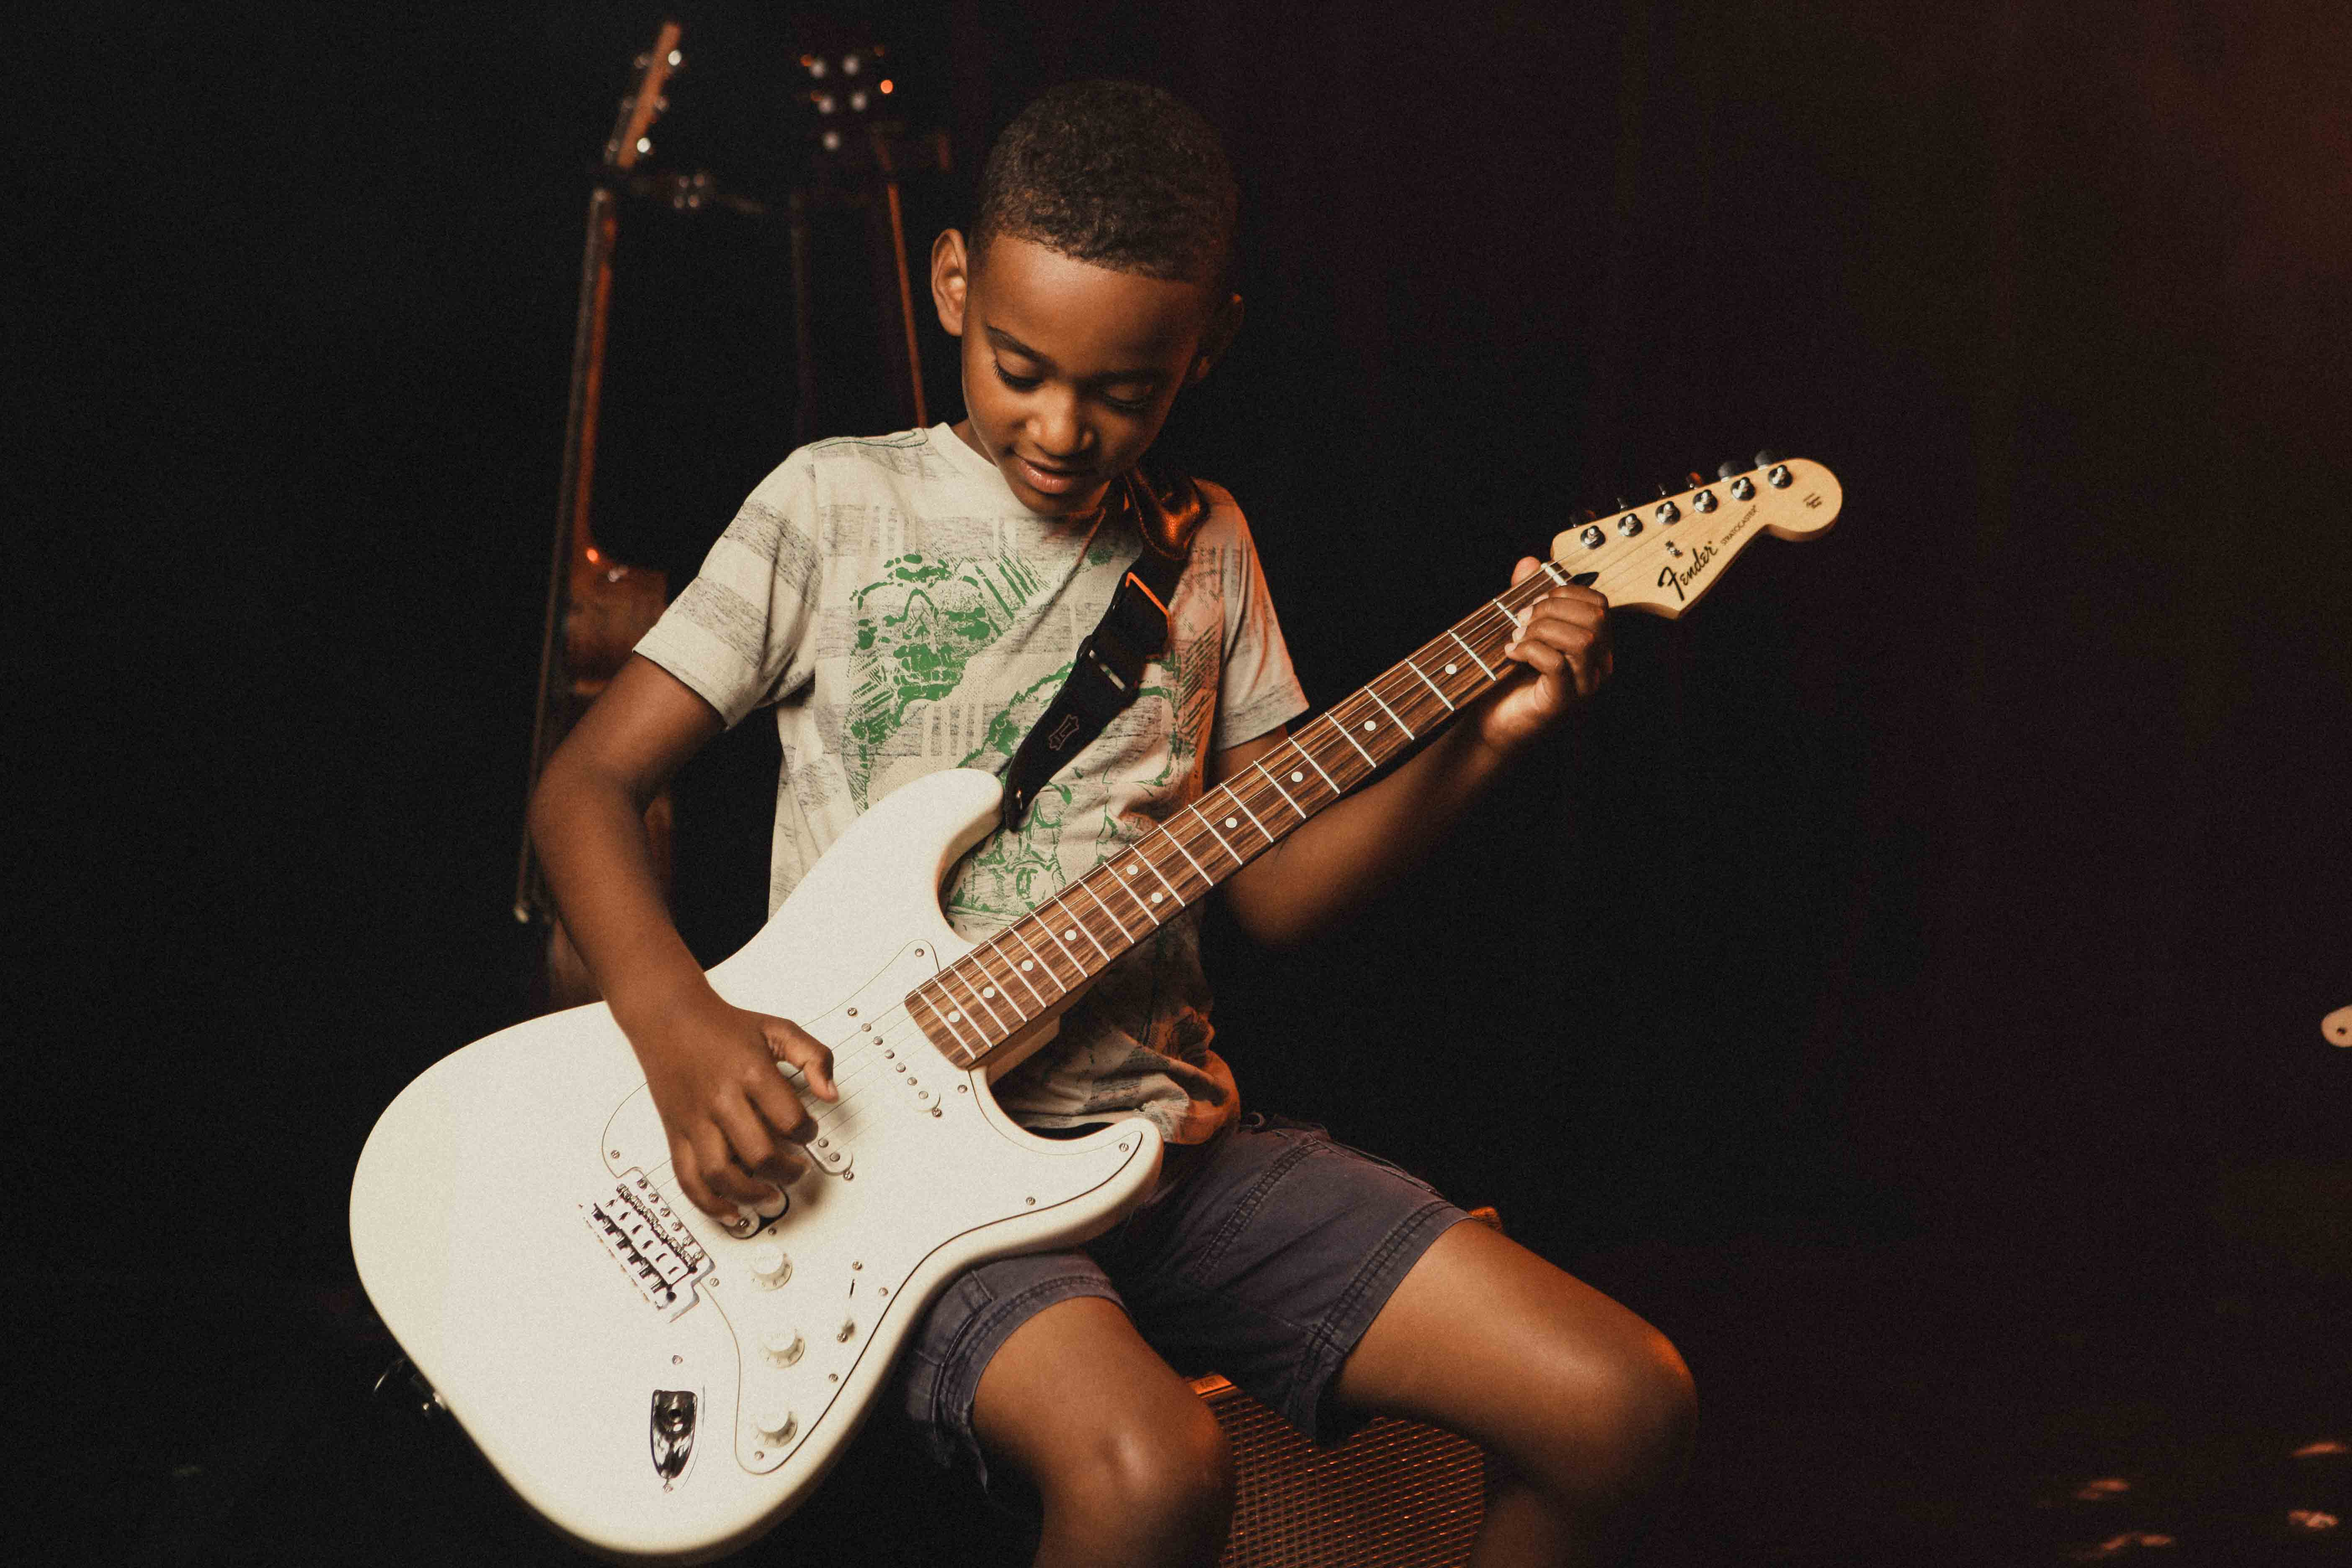 Kid playing bass guitar